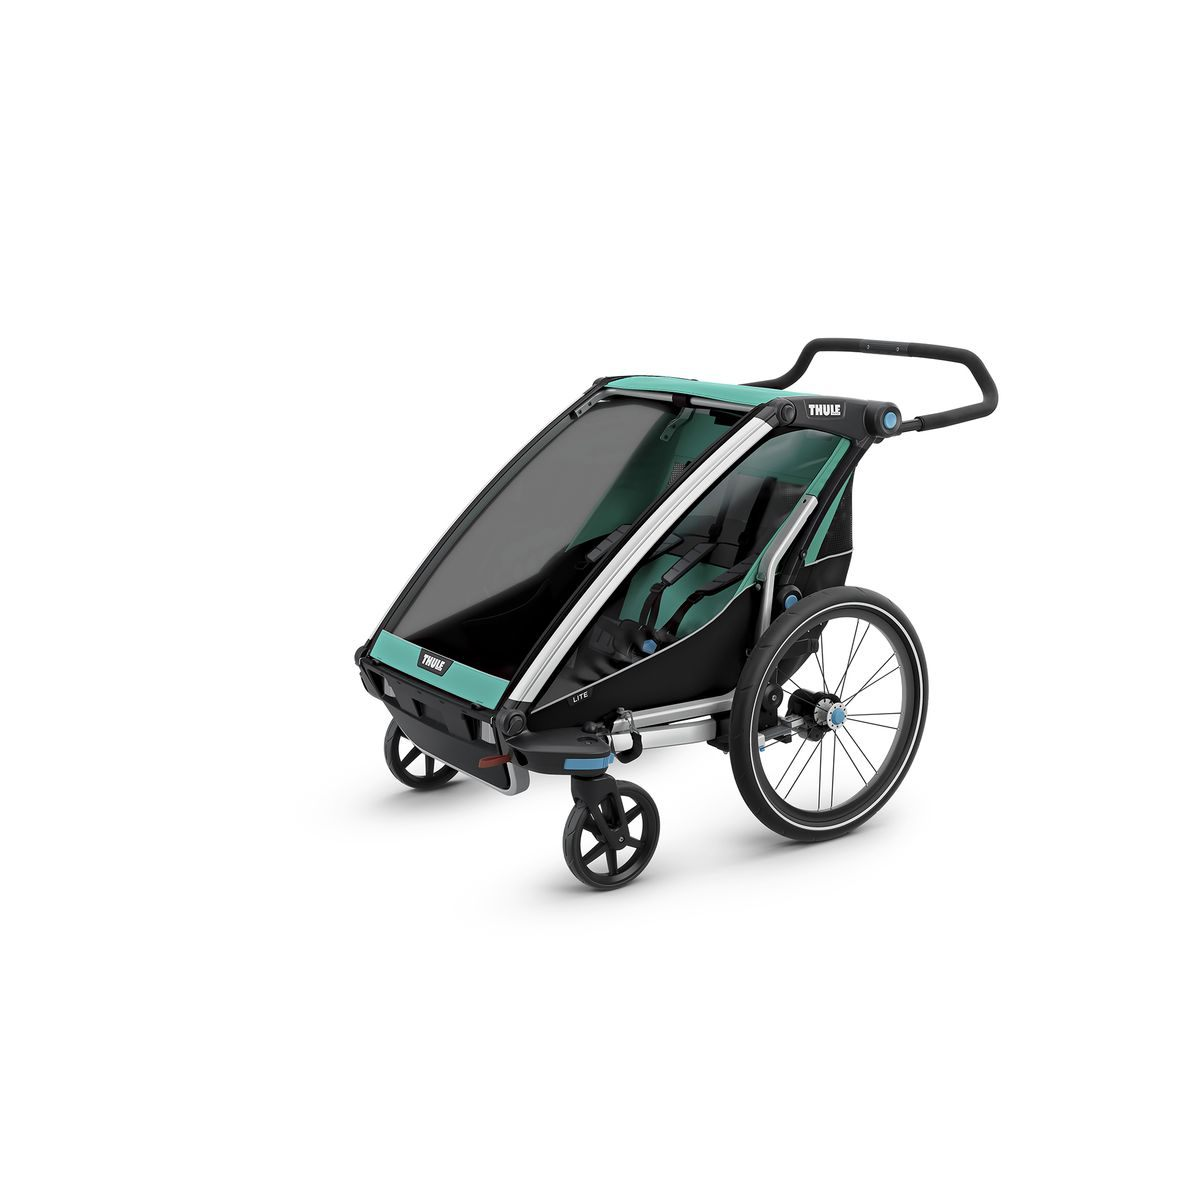 Thule Chariot Lite 2 Inspirant Kup Thule Chariot Chariot Lite Multisport Trailer